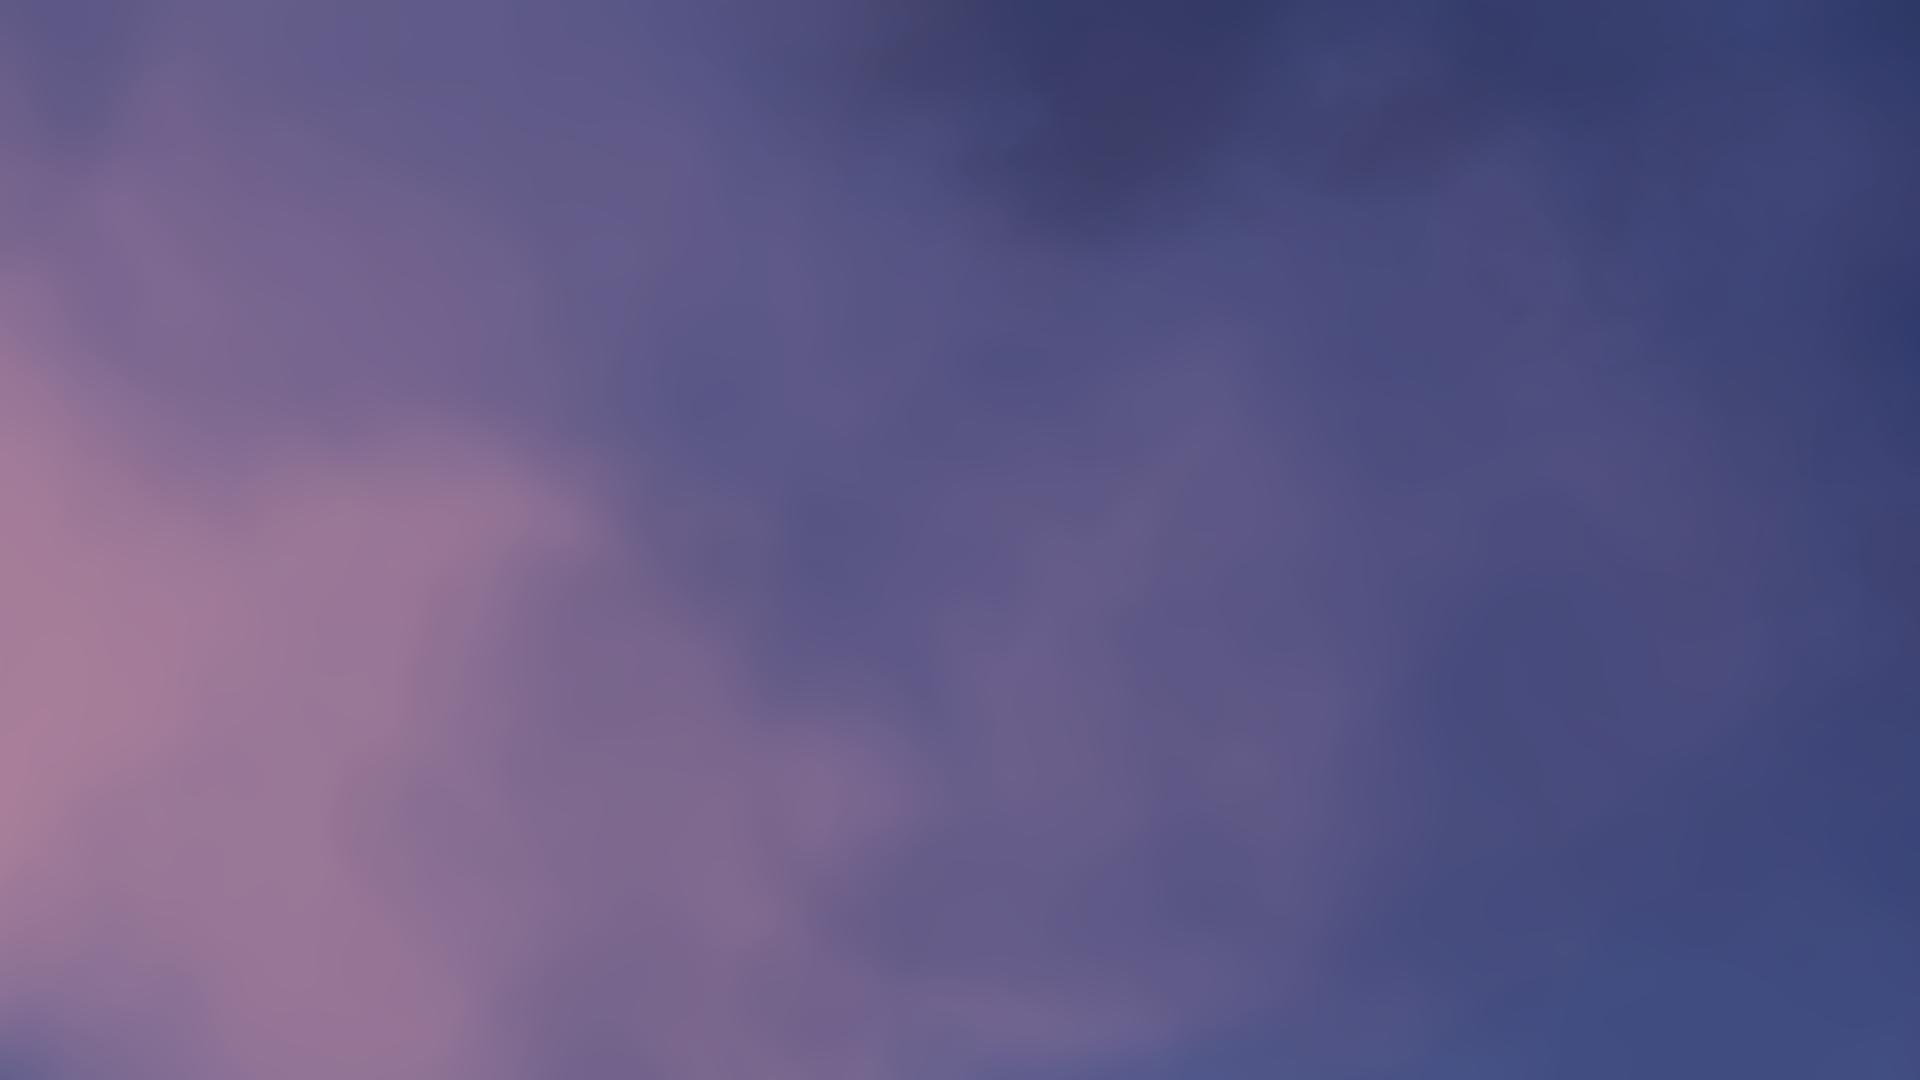 0303_BG_bg sky layer.png